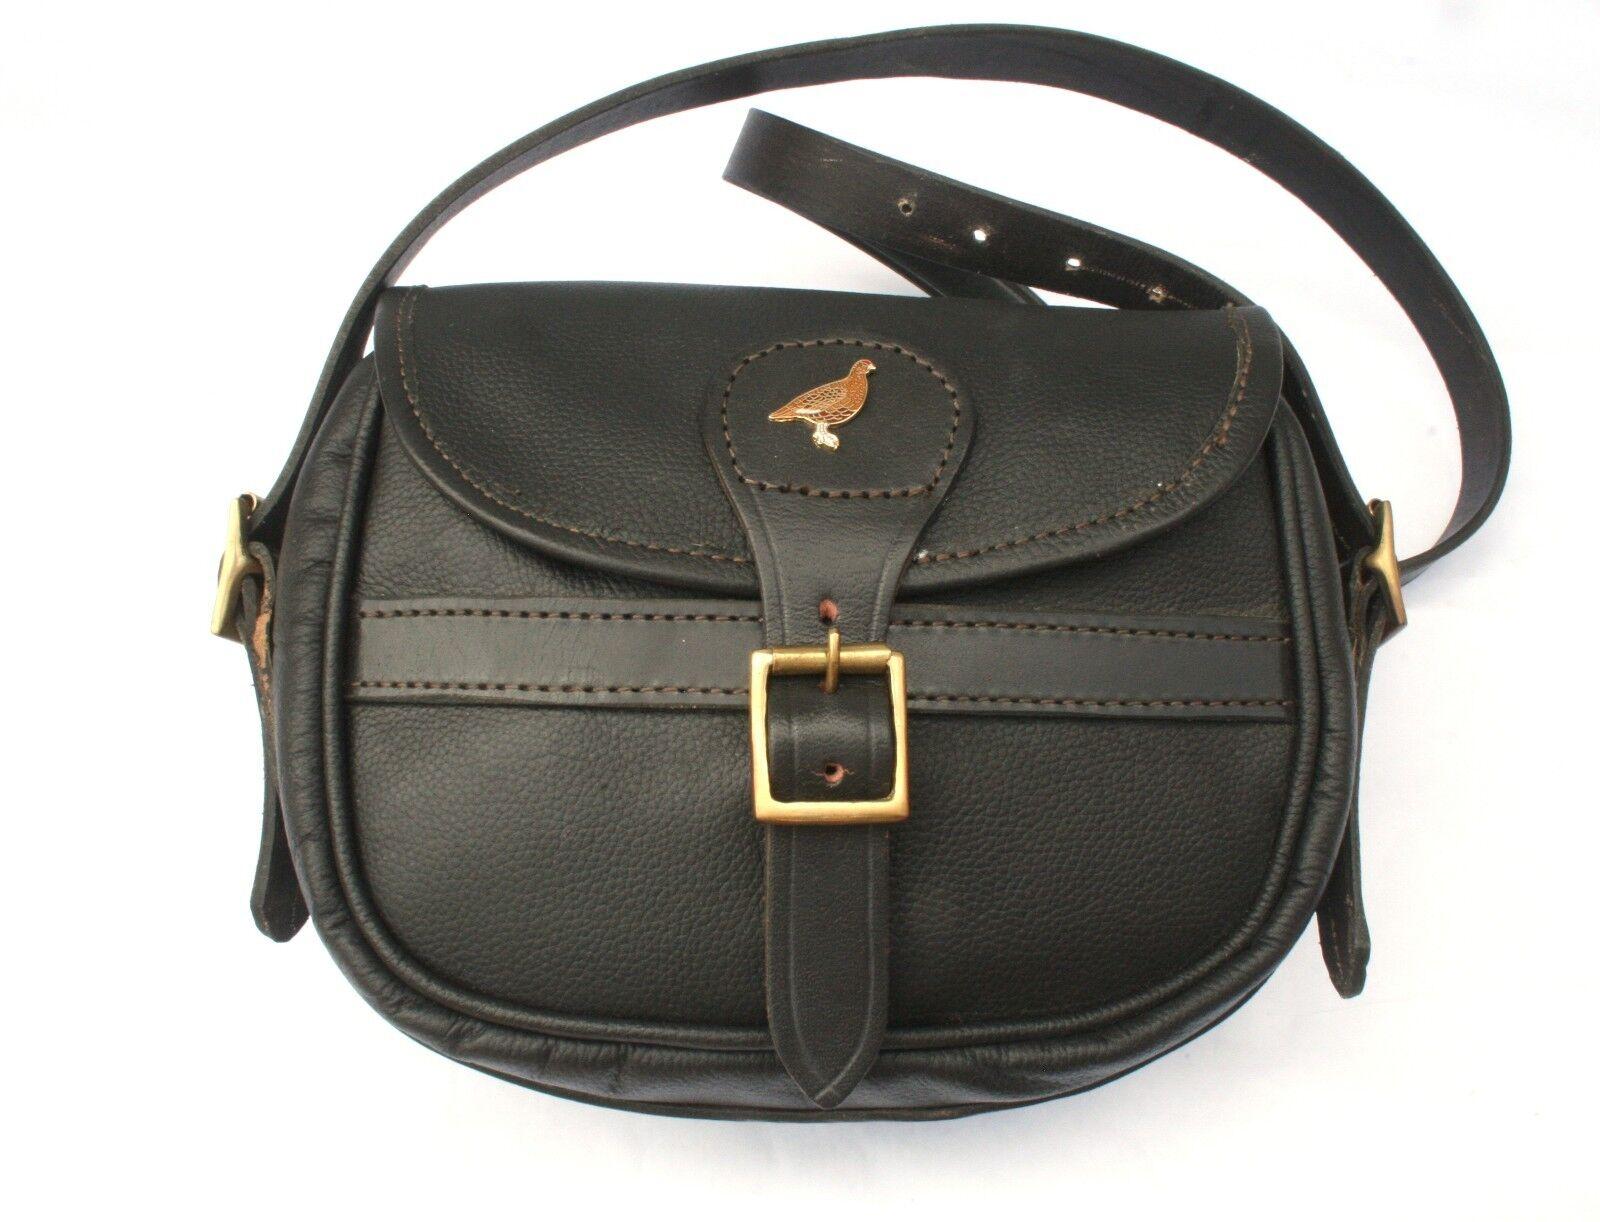 Grouse Enamel Leather Shooting Cartridge Bag 75 Capacity Game Shooting Gift